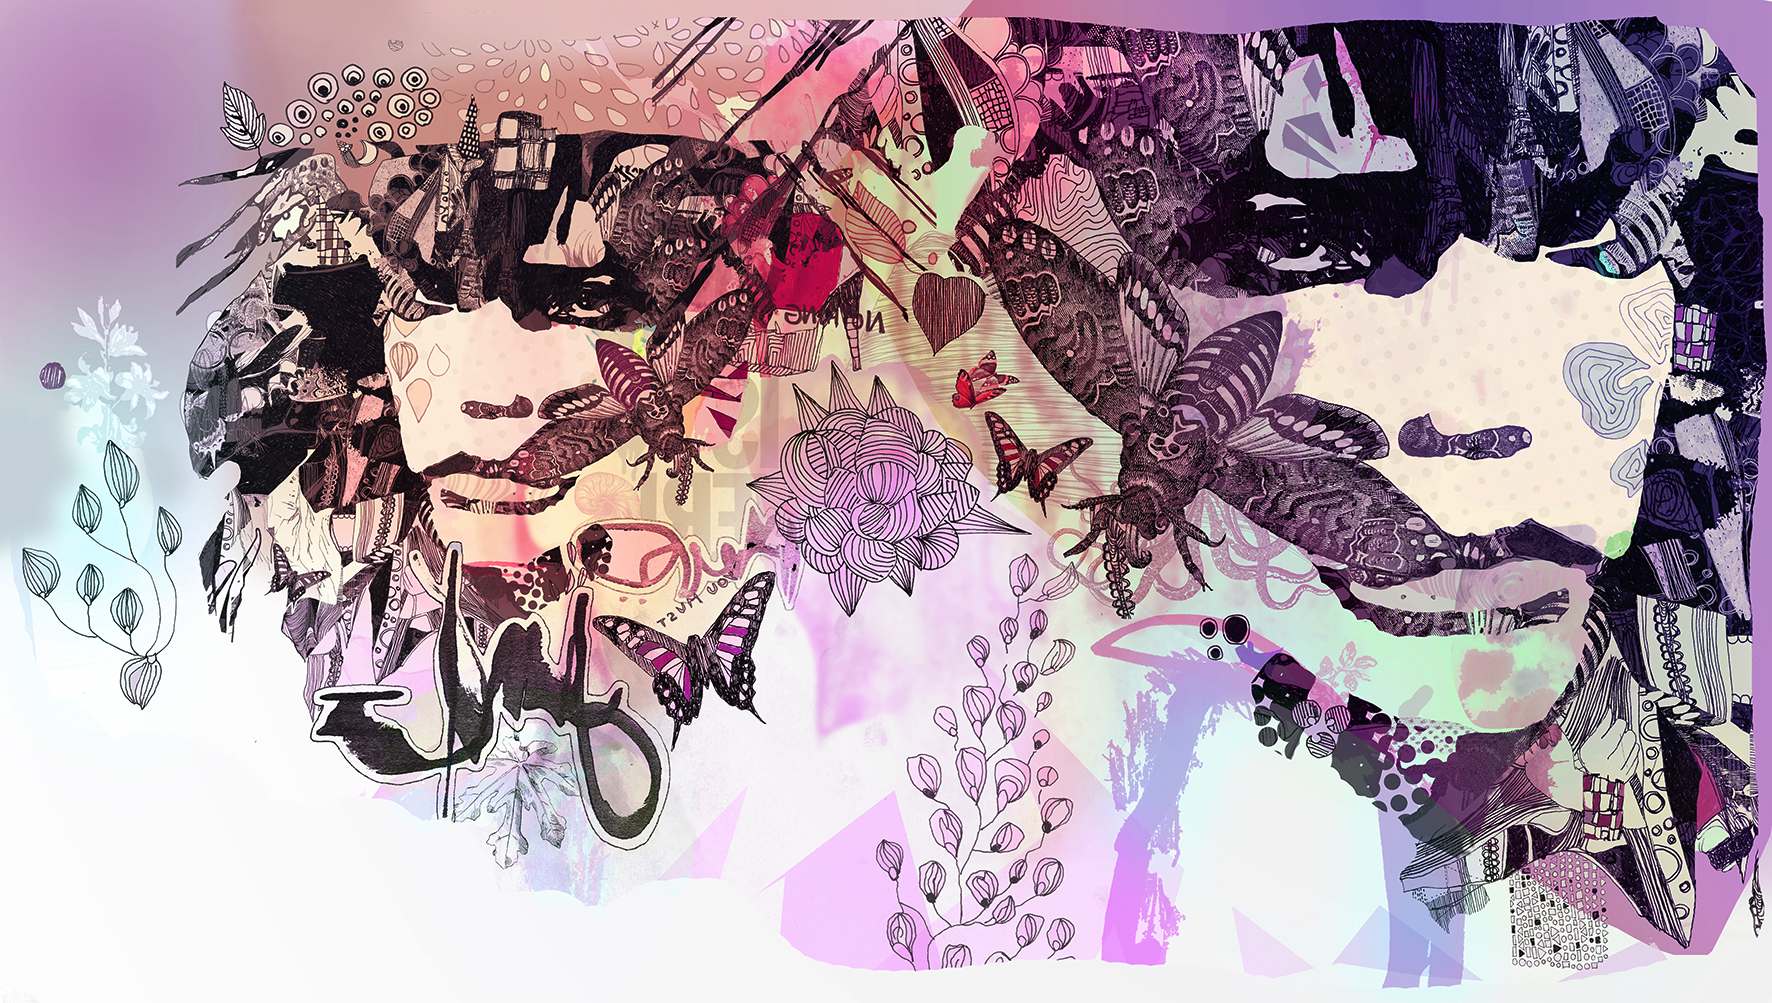 giulio is a self taught illustrator and graphic designer originally